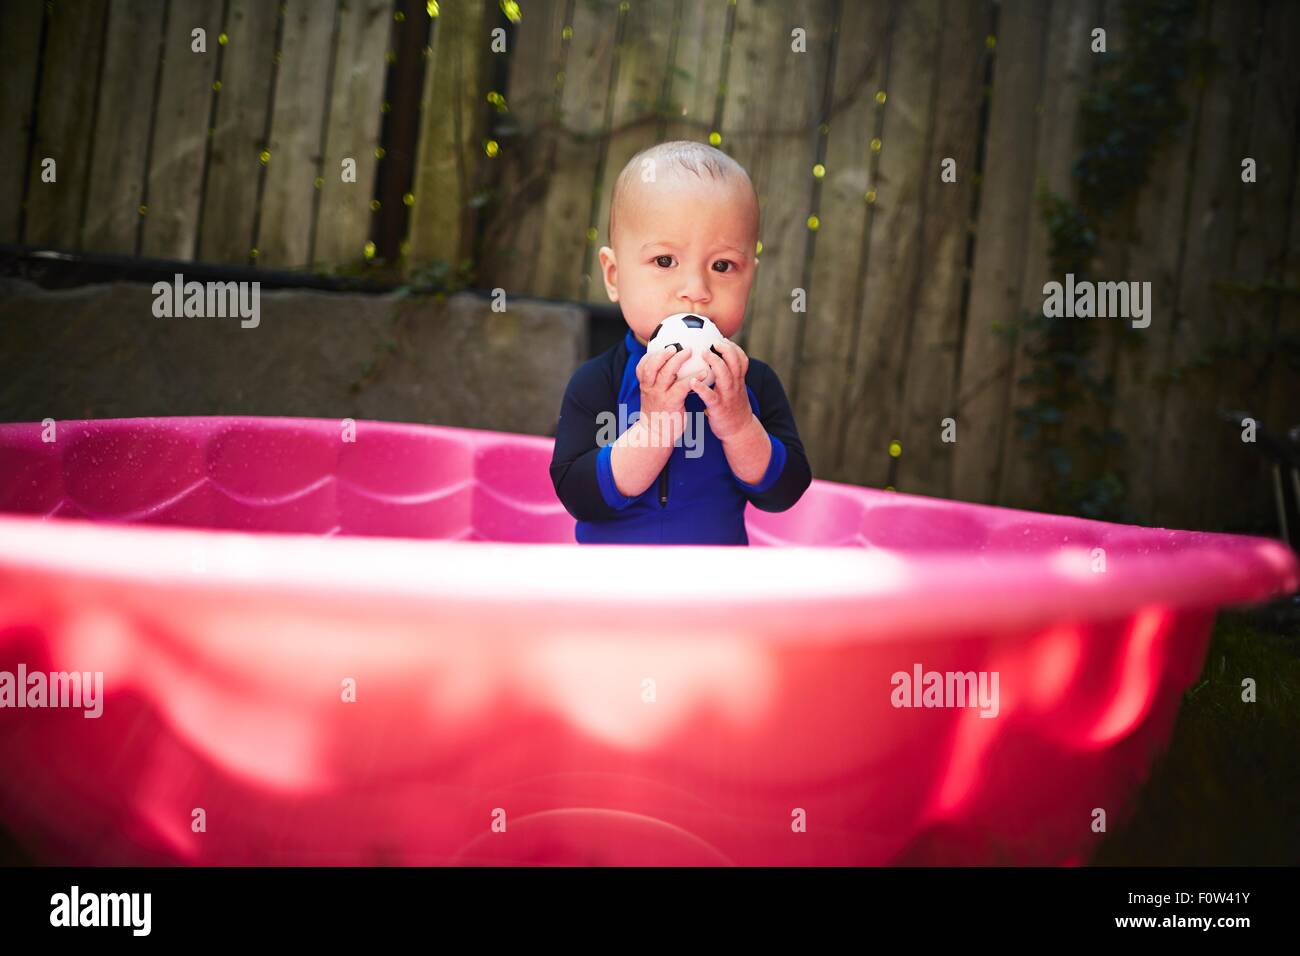 Baby boy inside pink tub - Stock Image